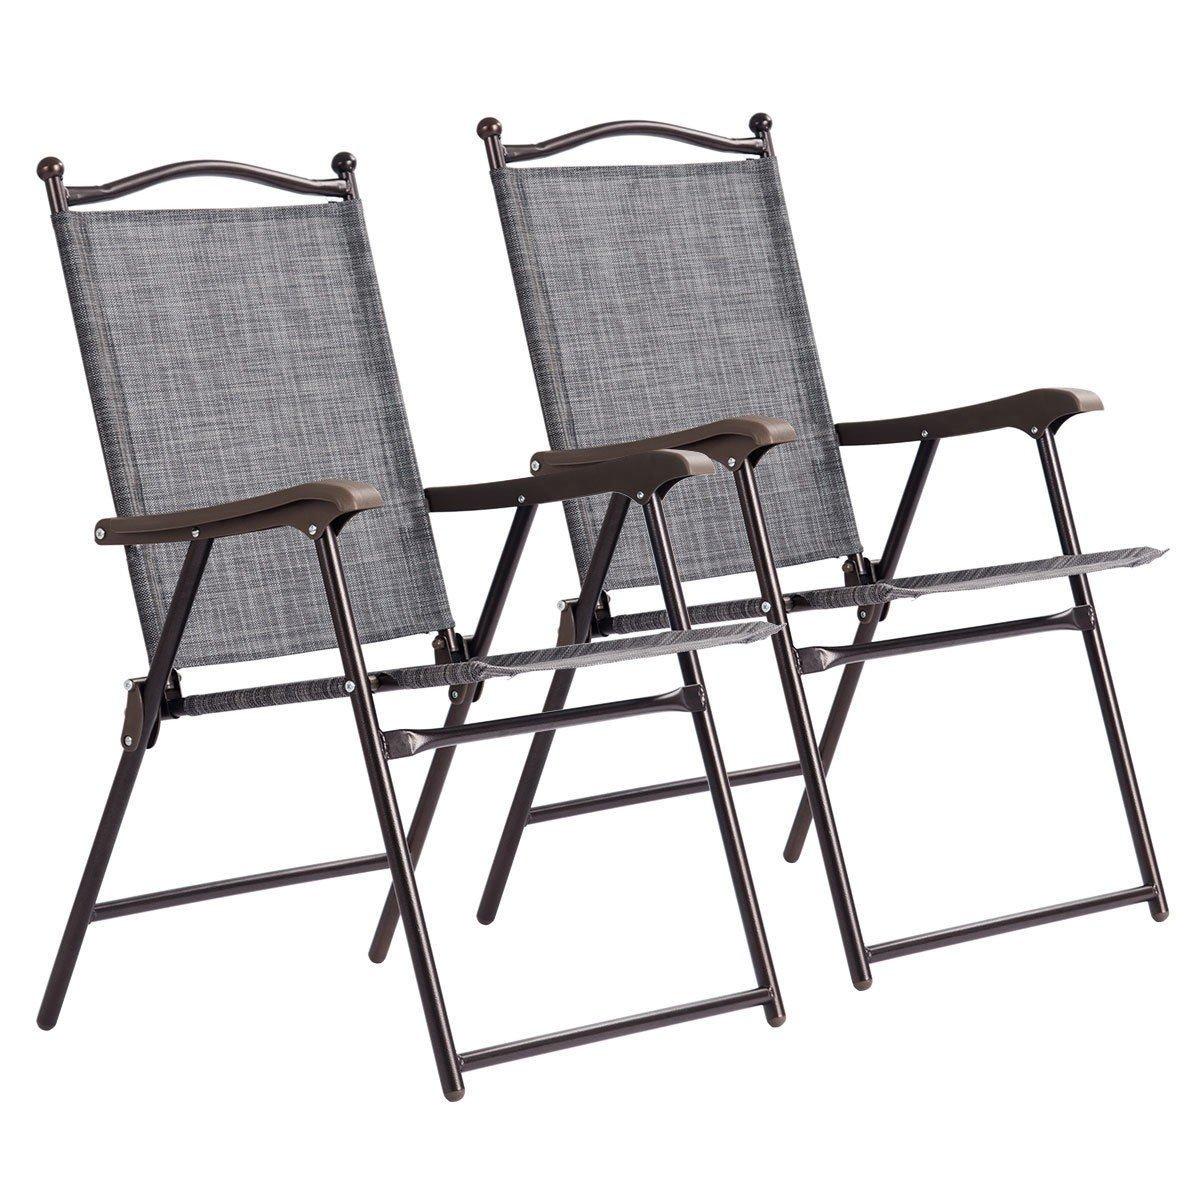 828fe4fd194 Amazon.com: Custpromo Set of 2 Patio Folding Sling Back Chairs ...